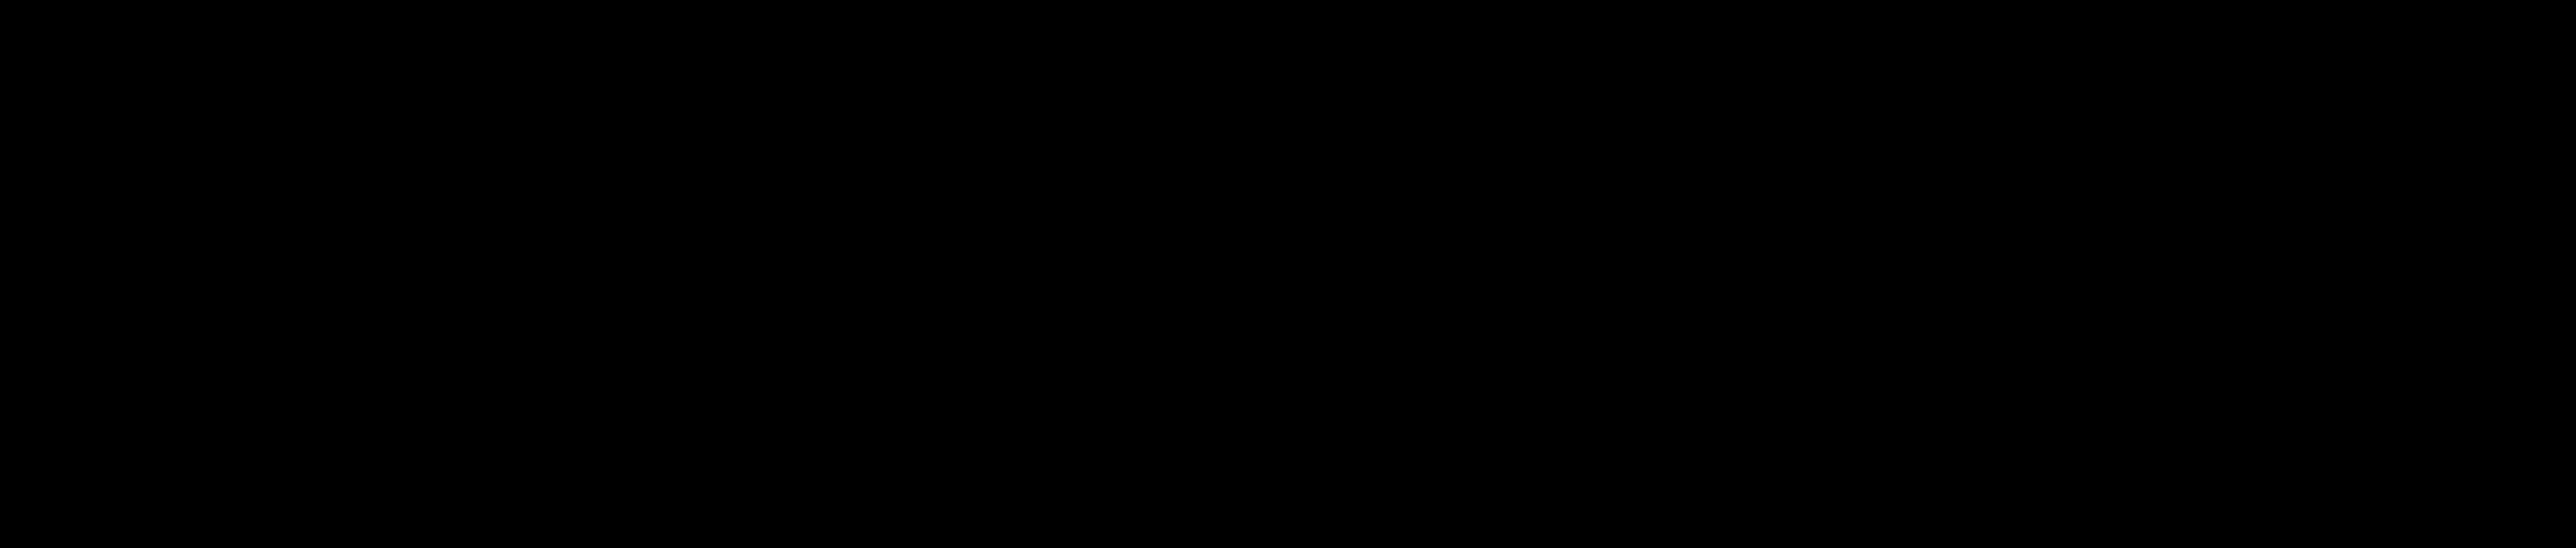 (E)-3-(4-methoxybenzylidene)-7-(6-(1,2,3,4-tetrahydroacridin-9-ylamino)hexyloxy)chroman-4-one